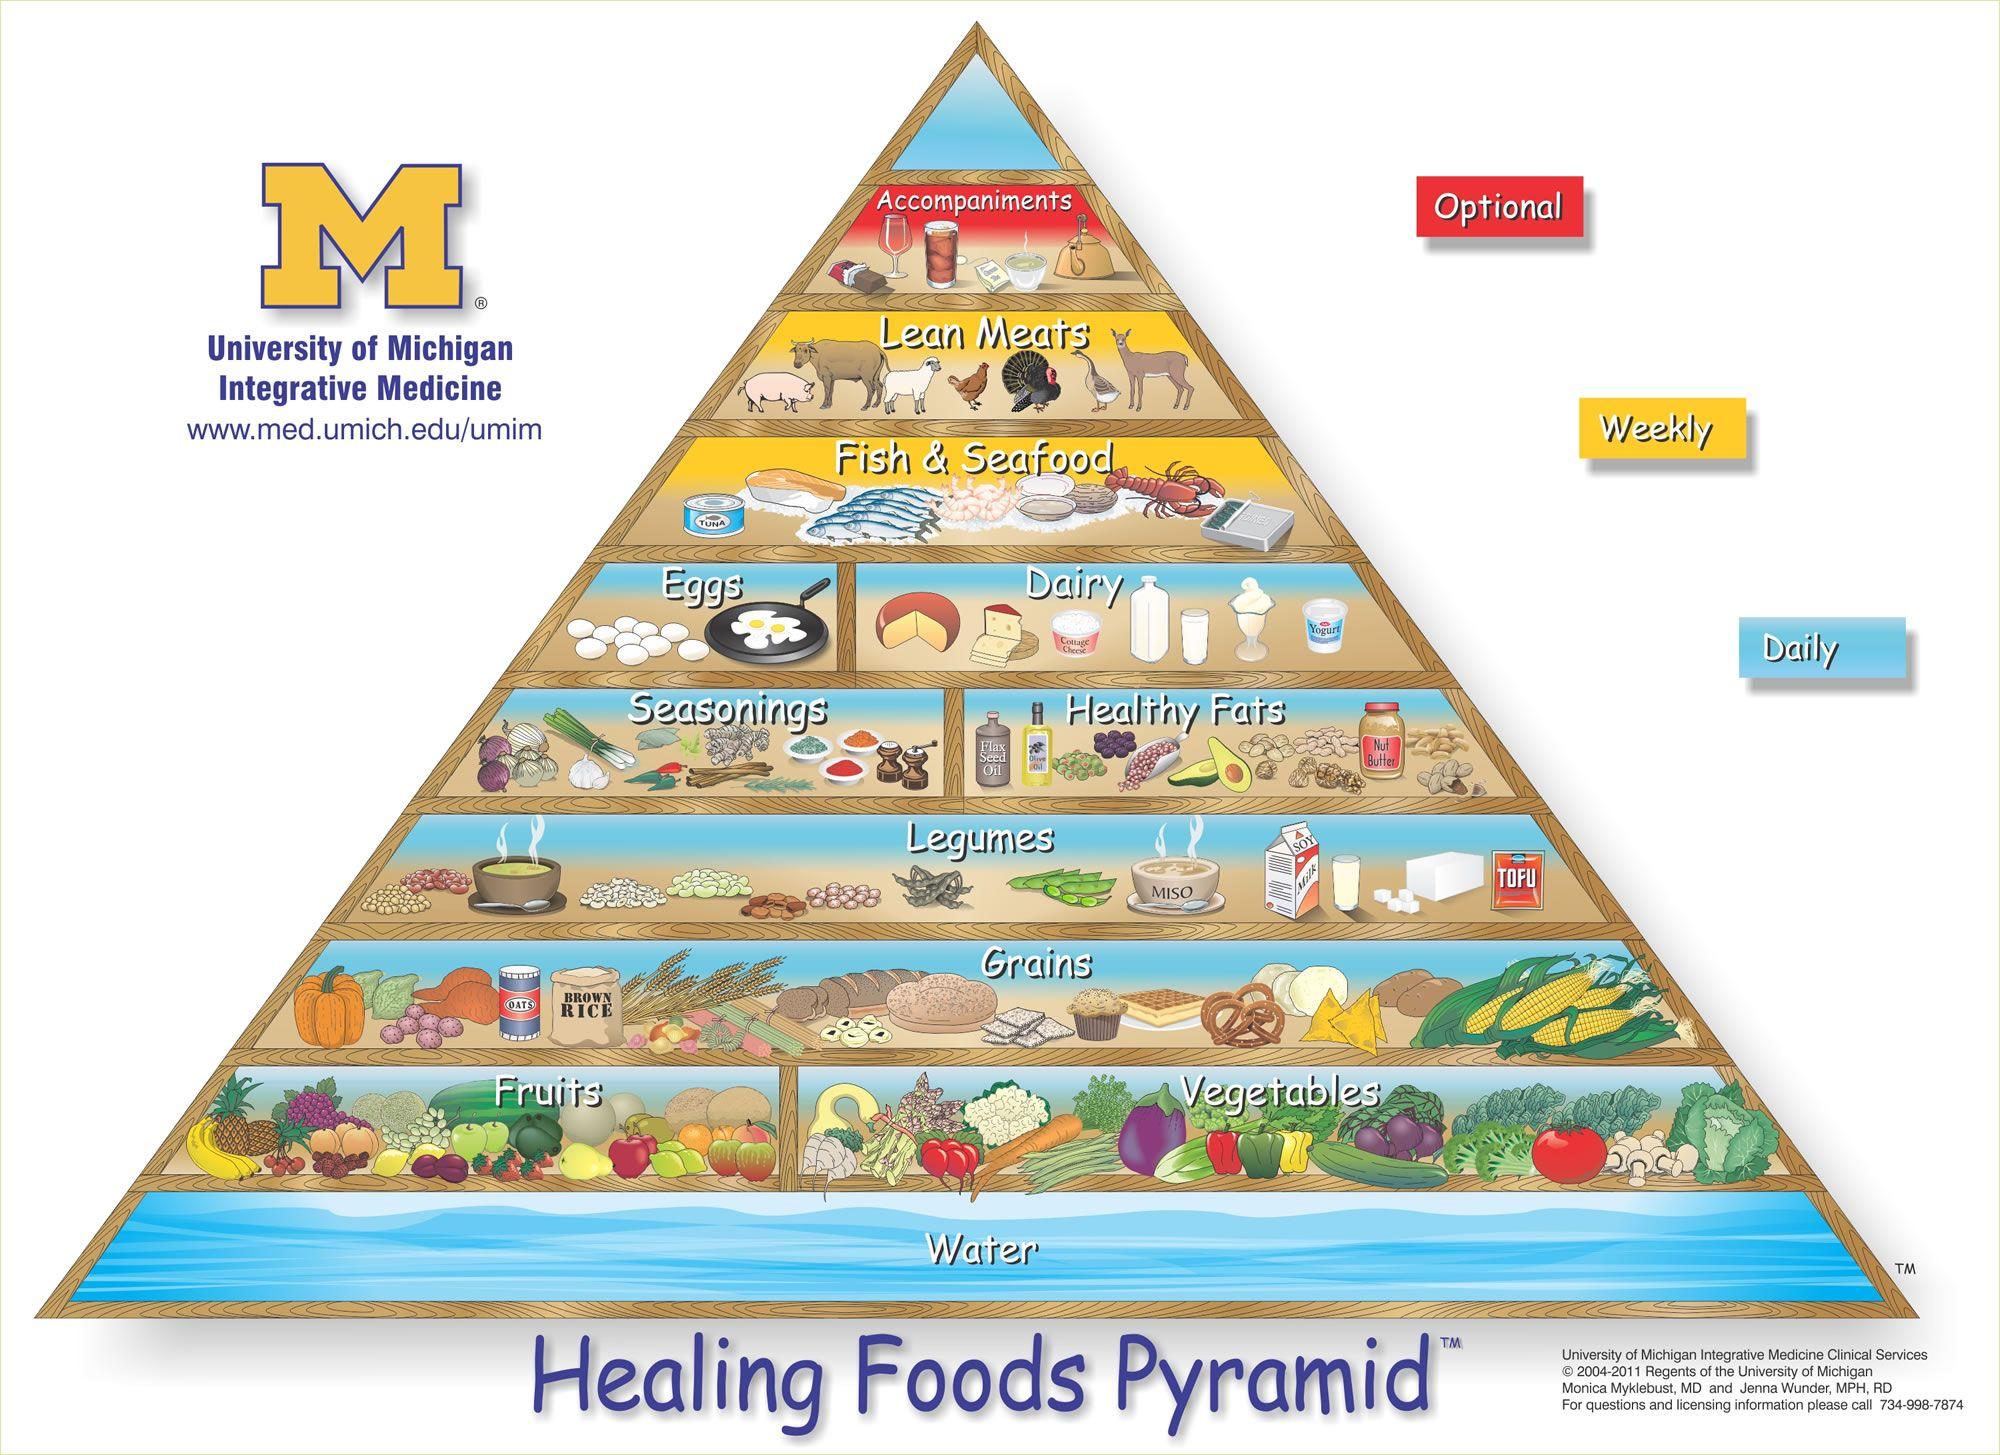 Healing Foods Pyramid http://www.med.umich.edu/umim/food-pyramid ...